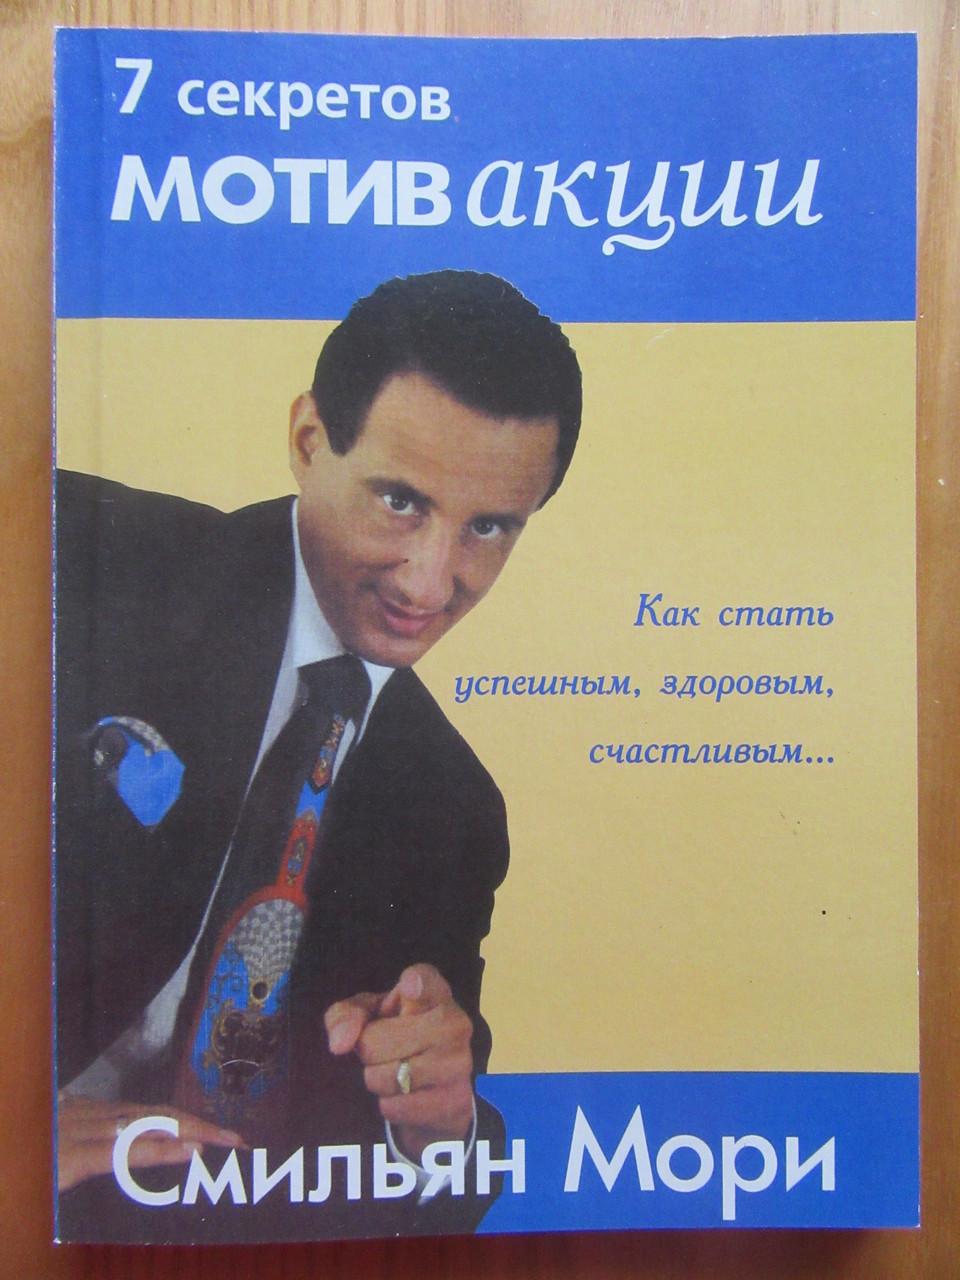 Смильян Мори. 7 секретов мотиваКции